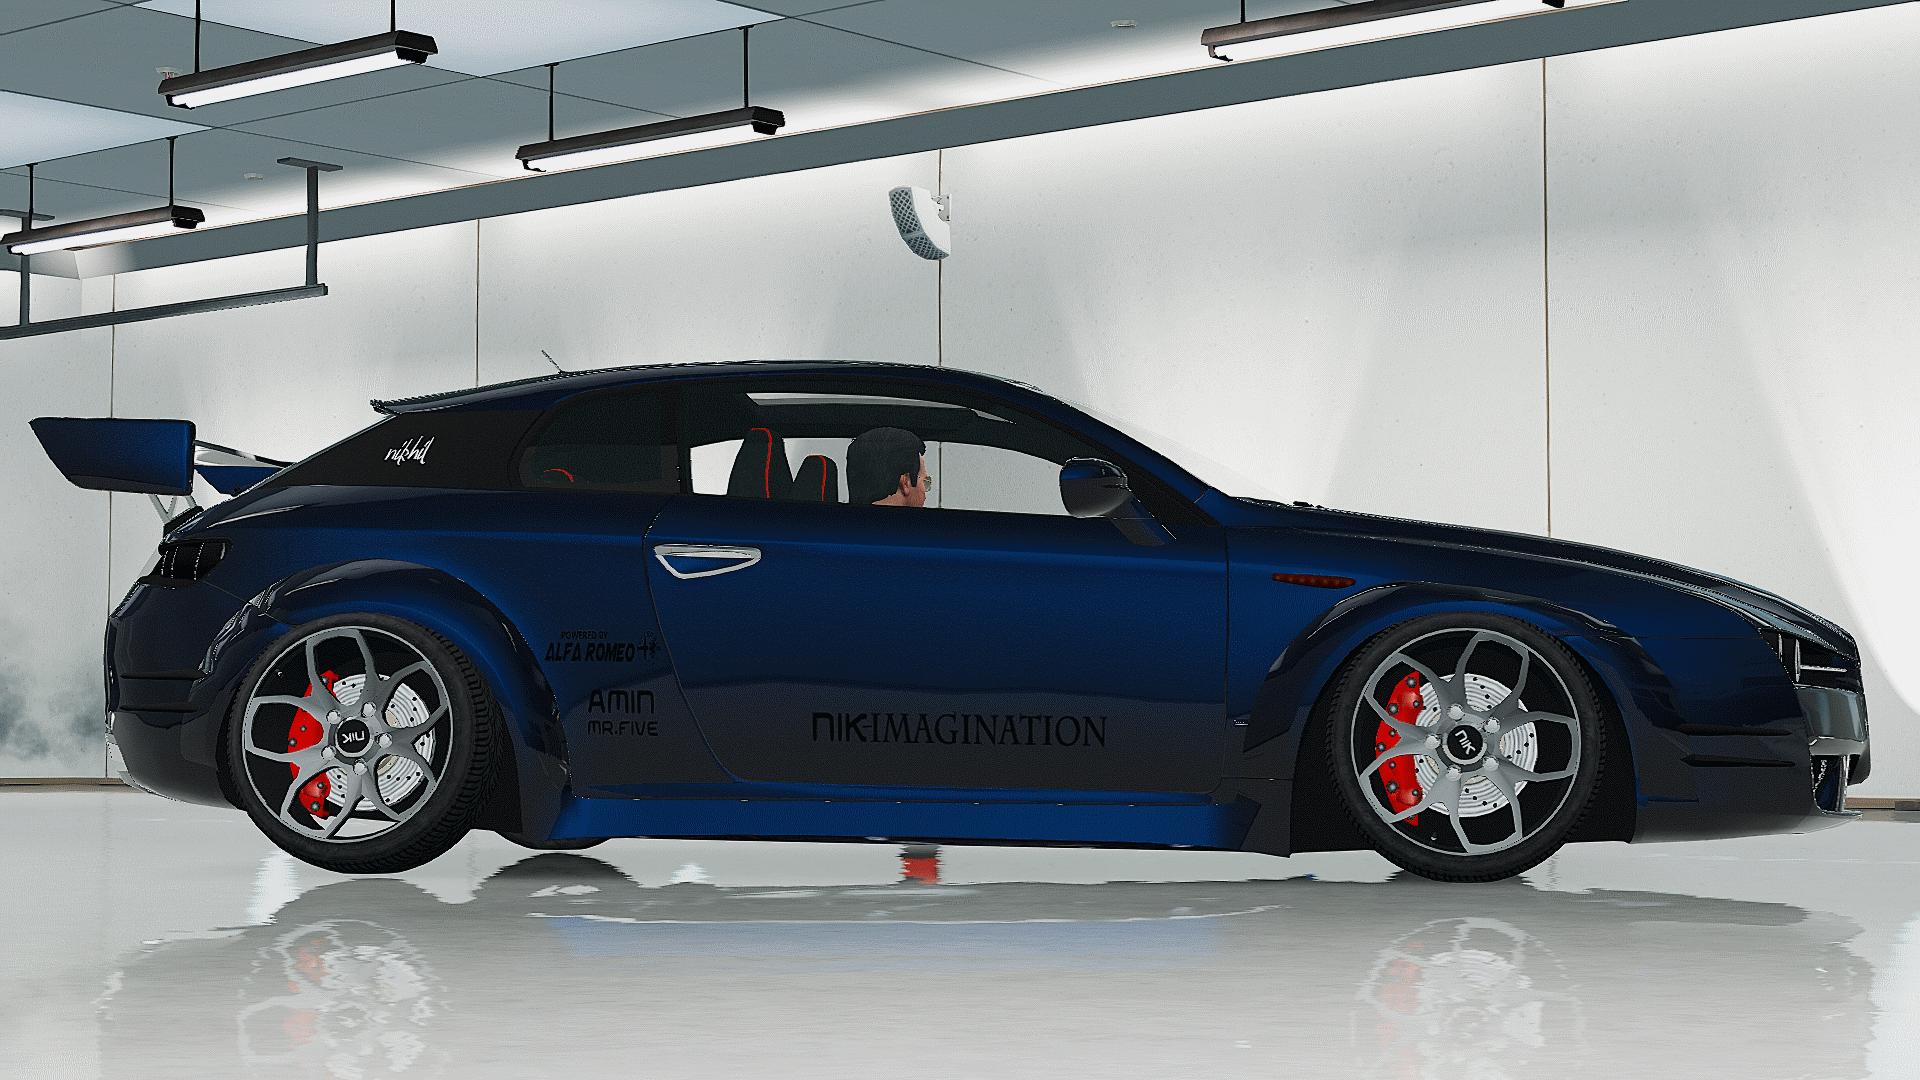 Alfa Romeo Brera Modified Nik Imagination Gta5 Mods Com